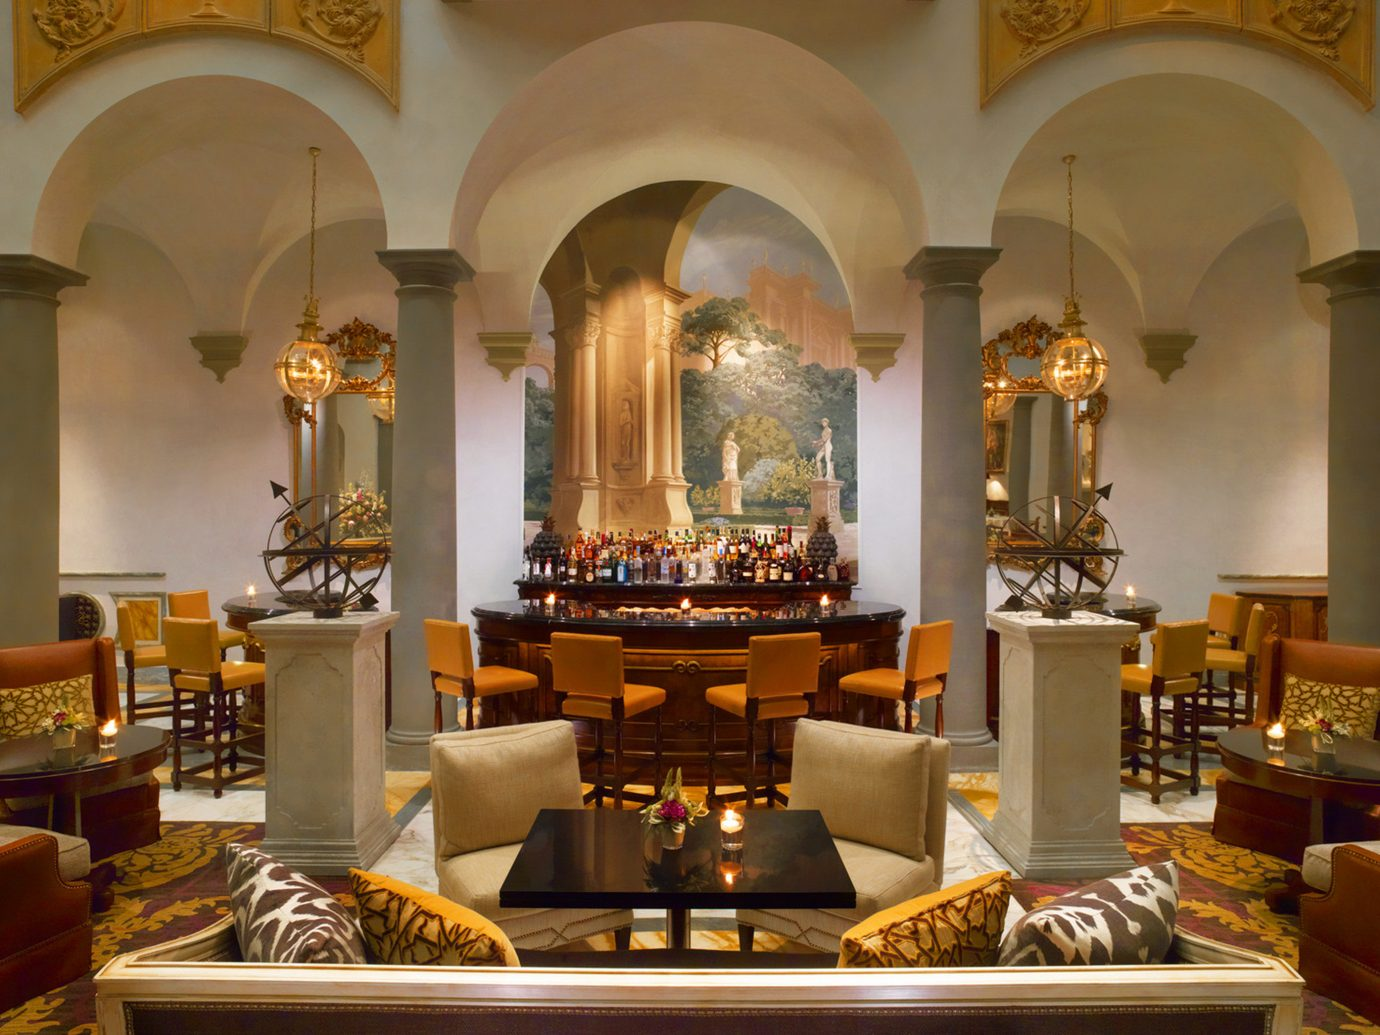 Bar Elegant Florence Historic Hotels Italy Lounge Luxury wall indoor room estate interior design altar living room